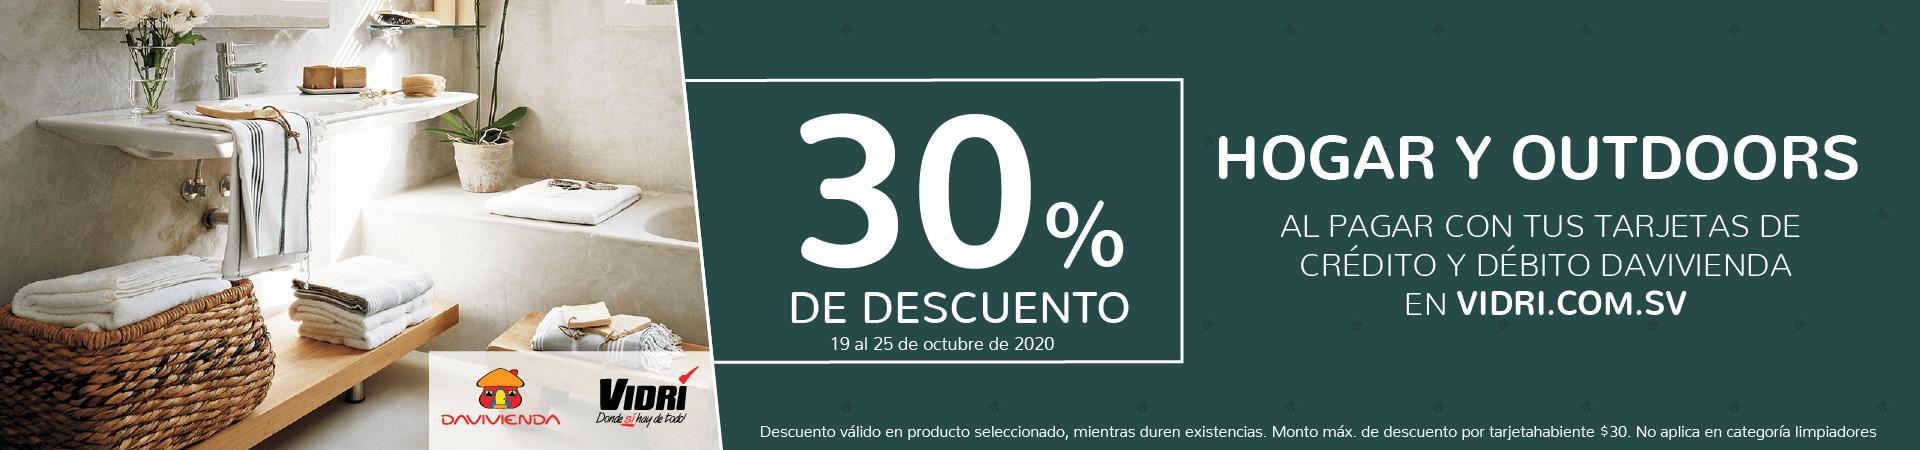 Promo_Davivienda